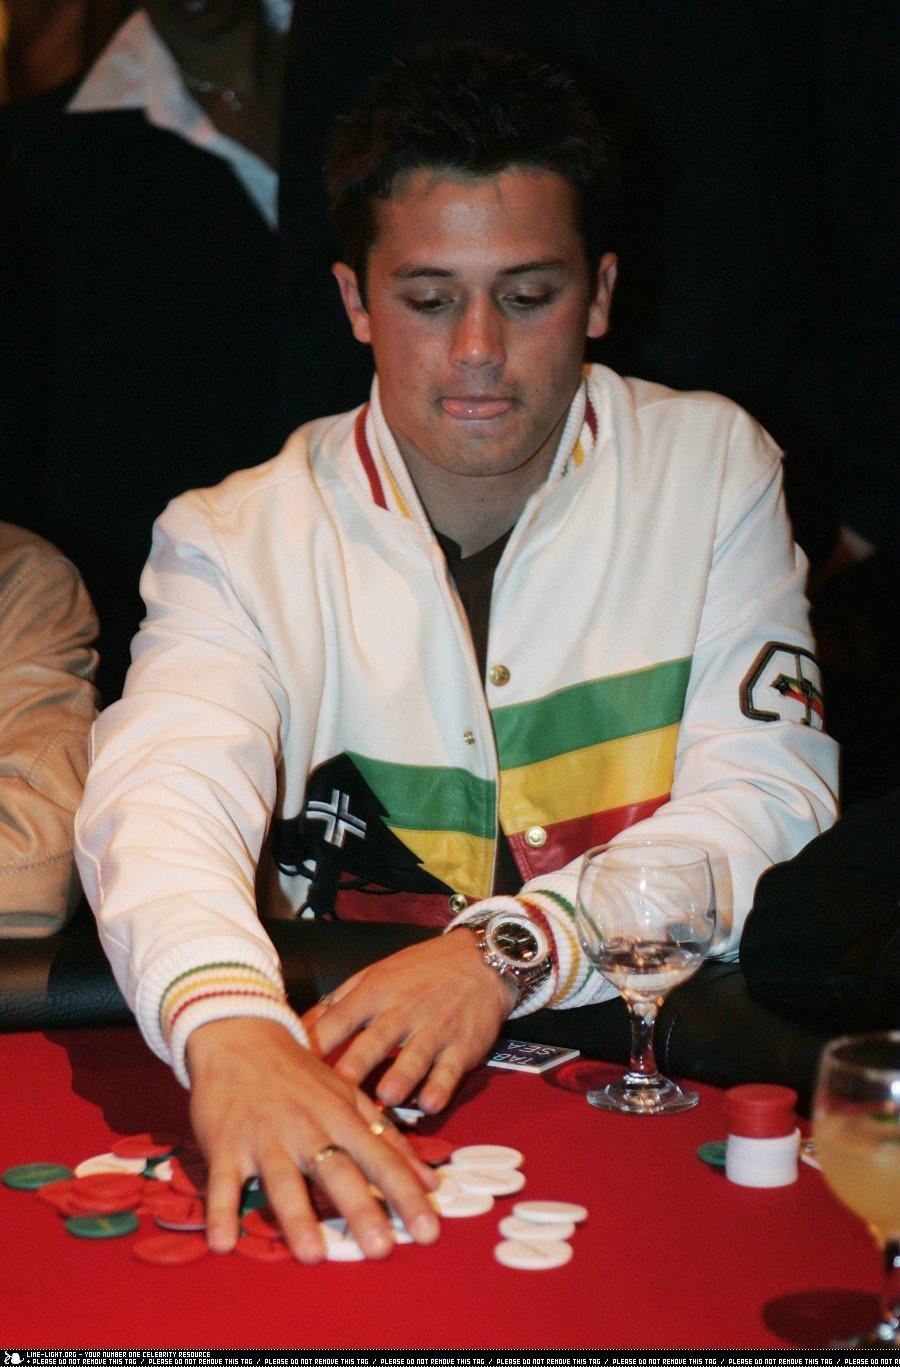 Stephen Colletti of Laguna Beach